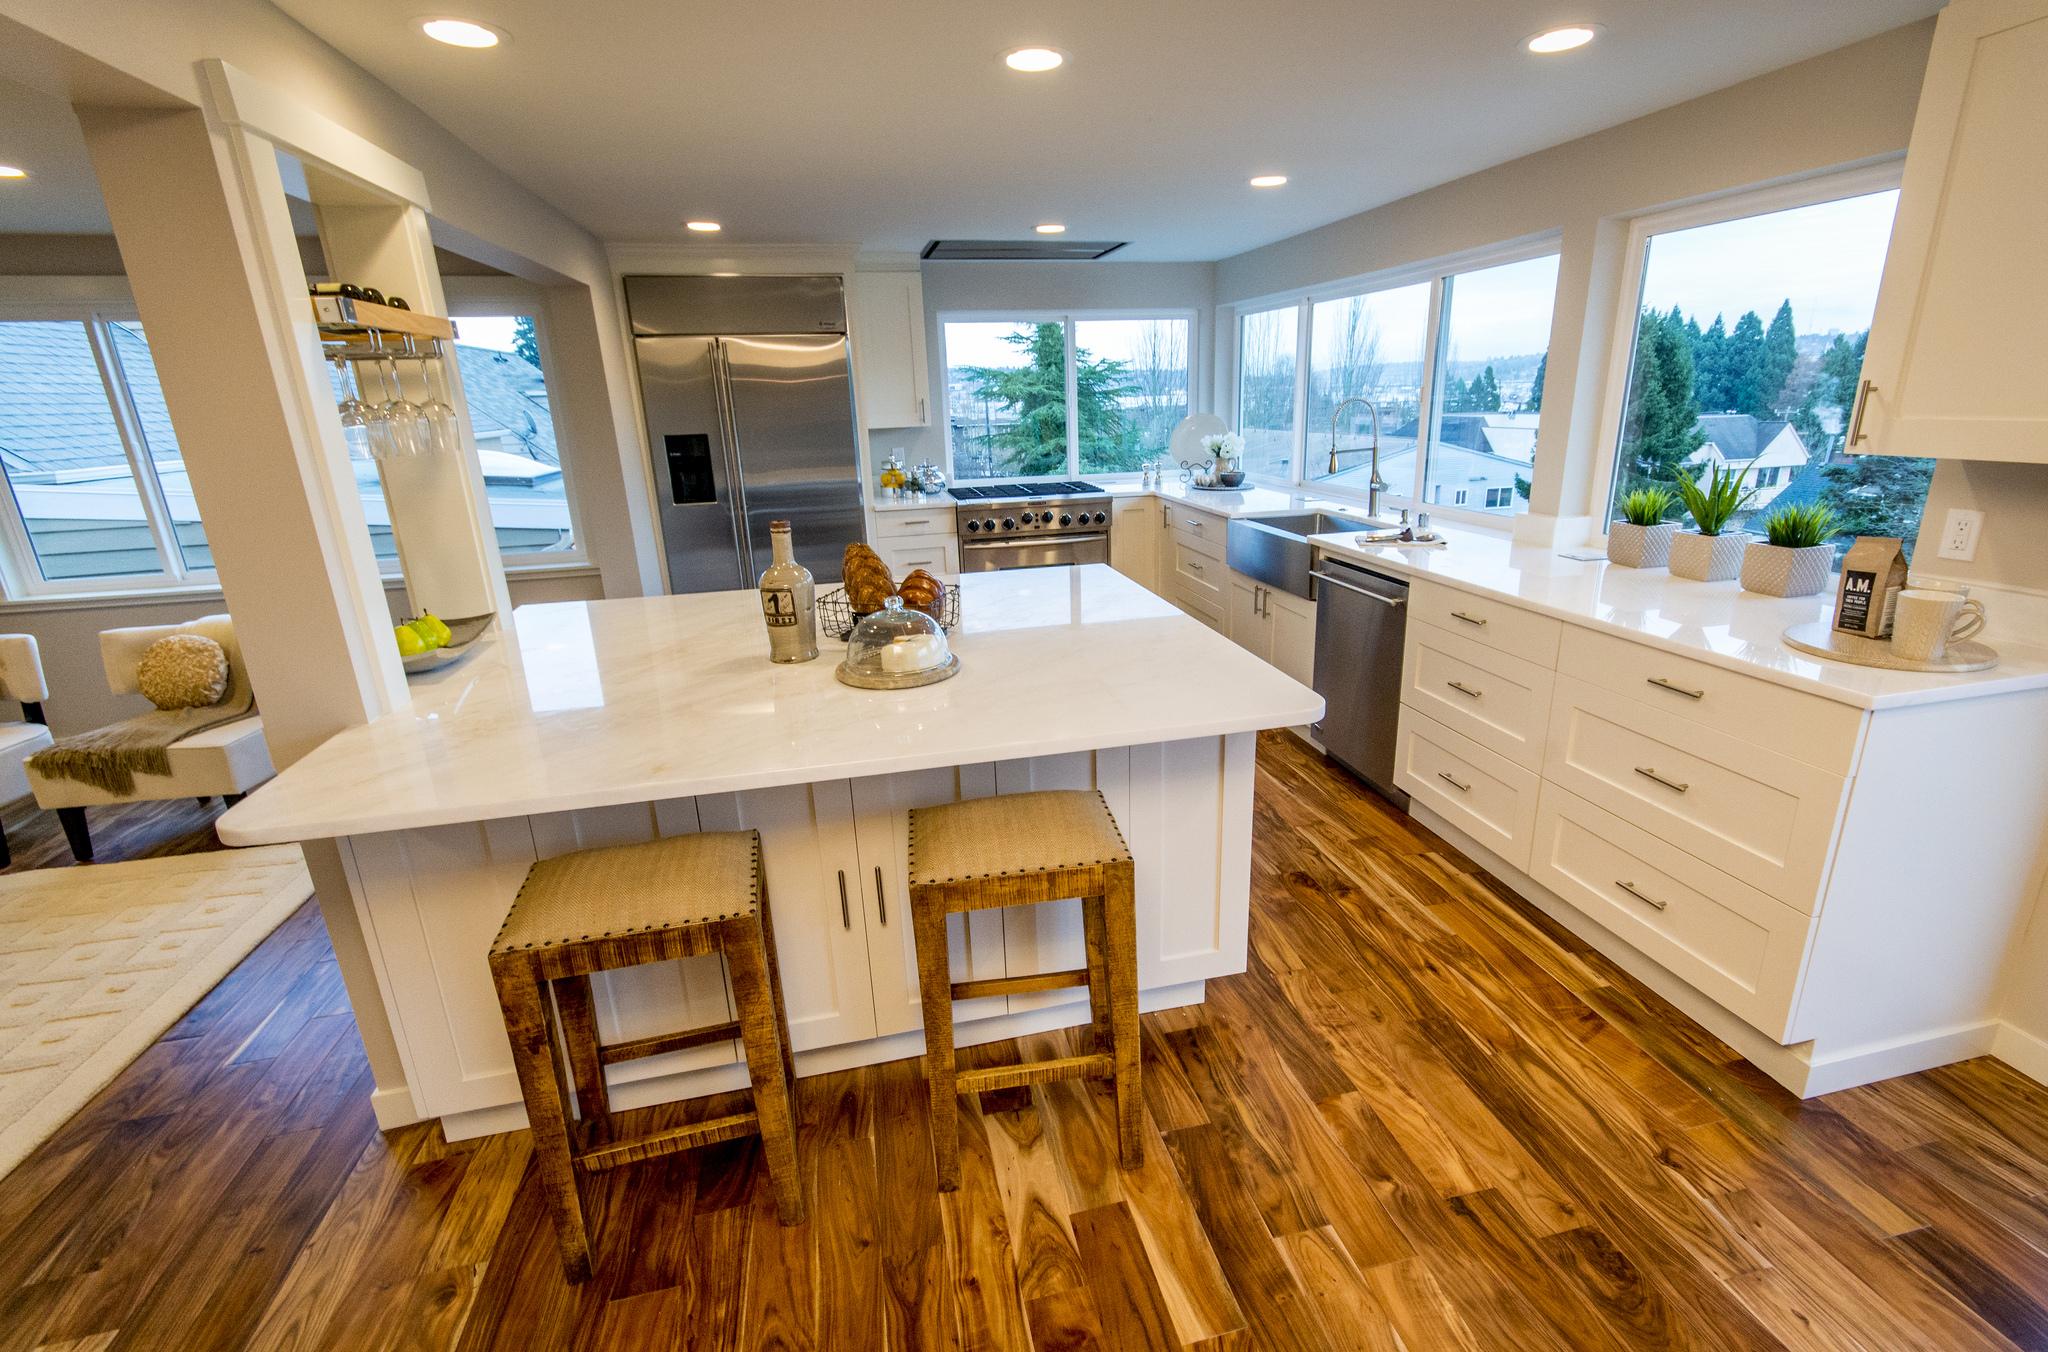 Kitchen Remodel and Repair 007